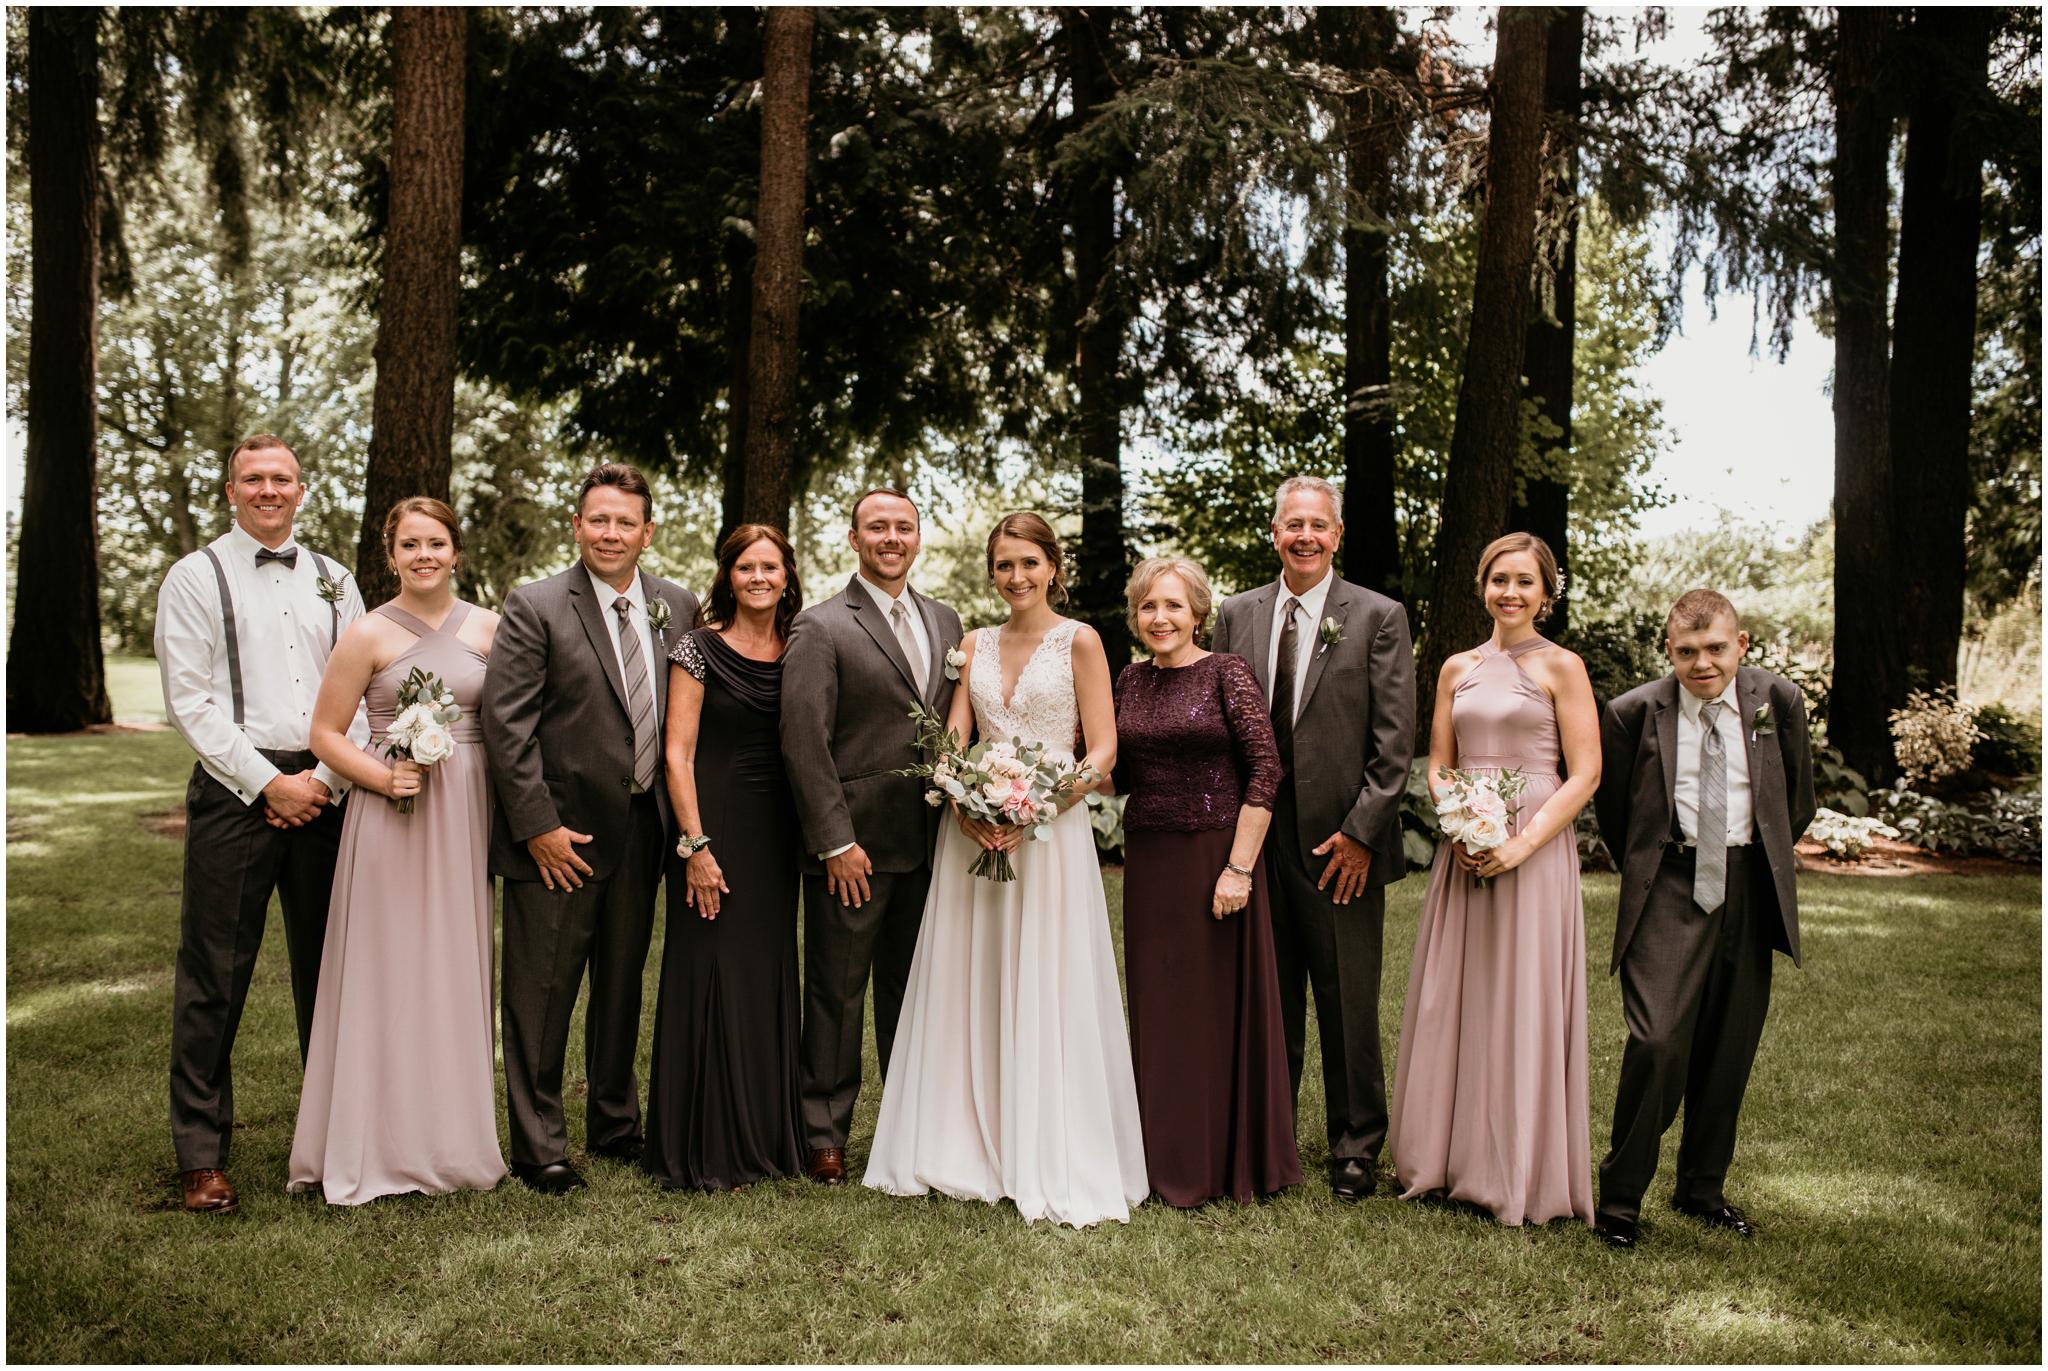 erin-and-tyler-evergreen-gardens-bellingham-wedding-photographer-050.jpg